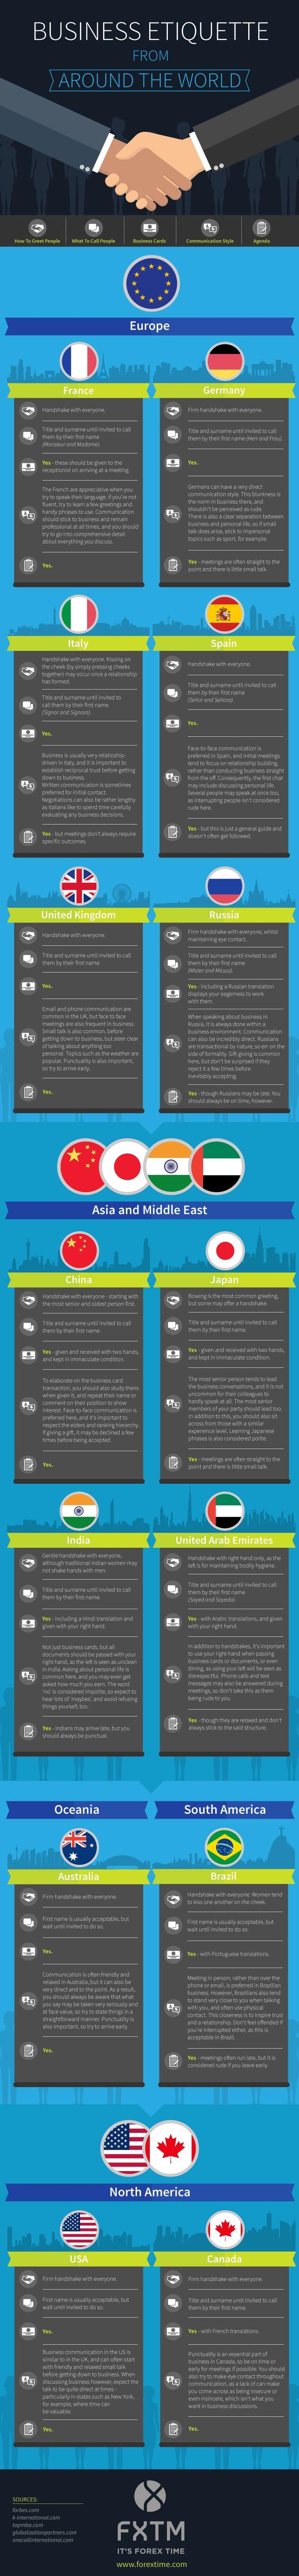 Business Etiquette infographic